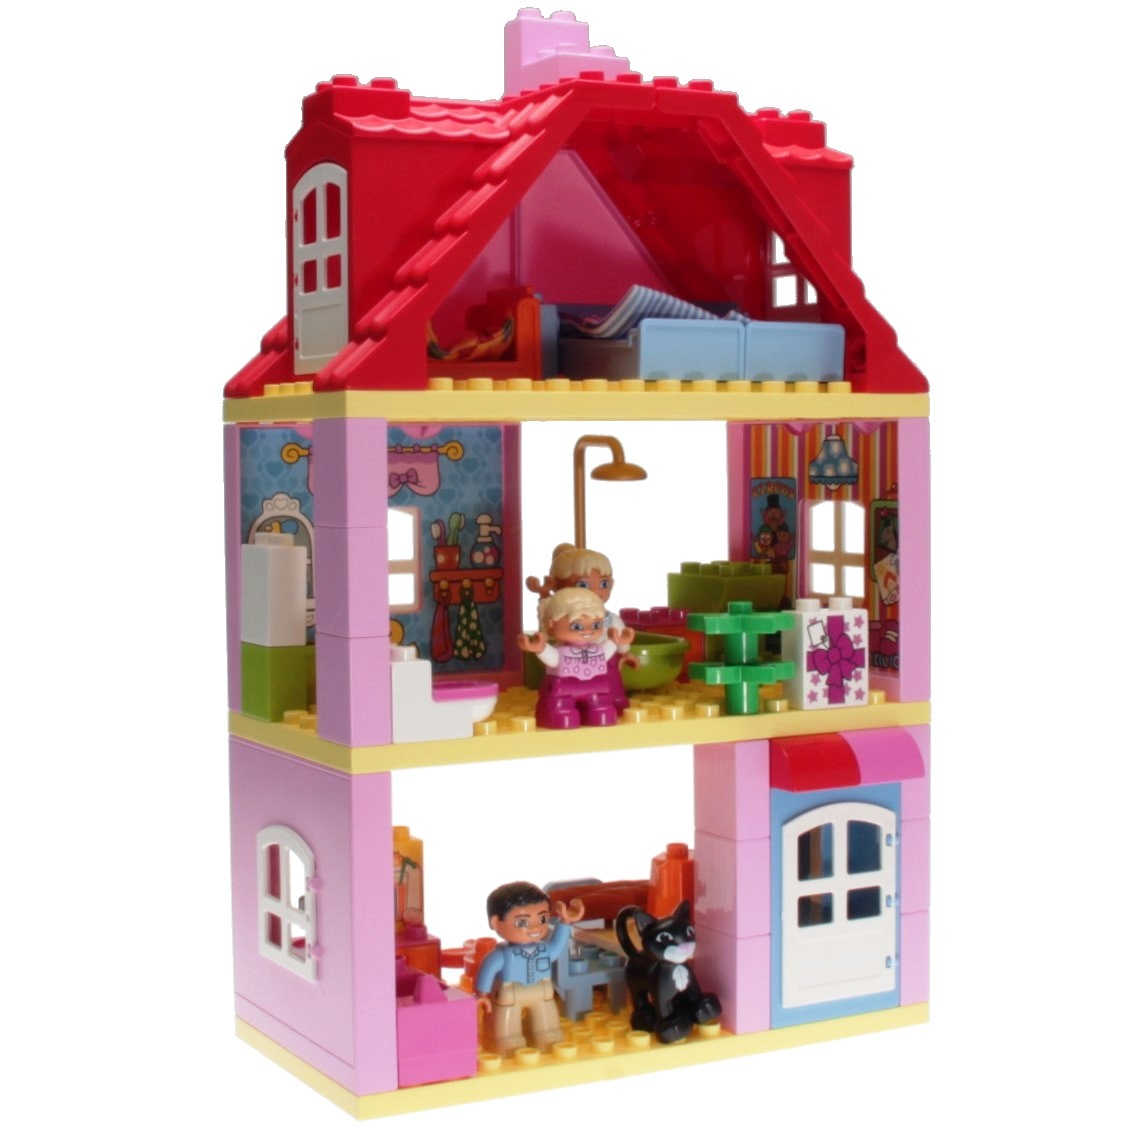 Lego Duplo 10505 - Familienhaus - DECOTOYS